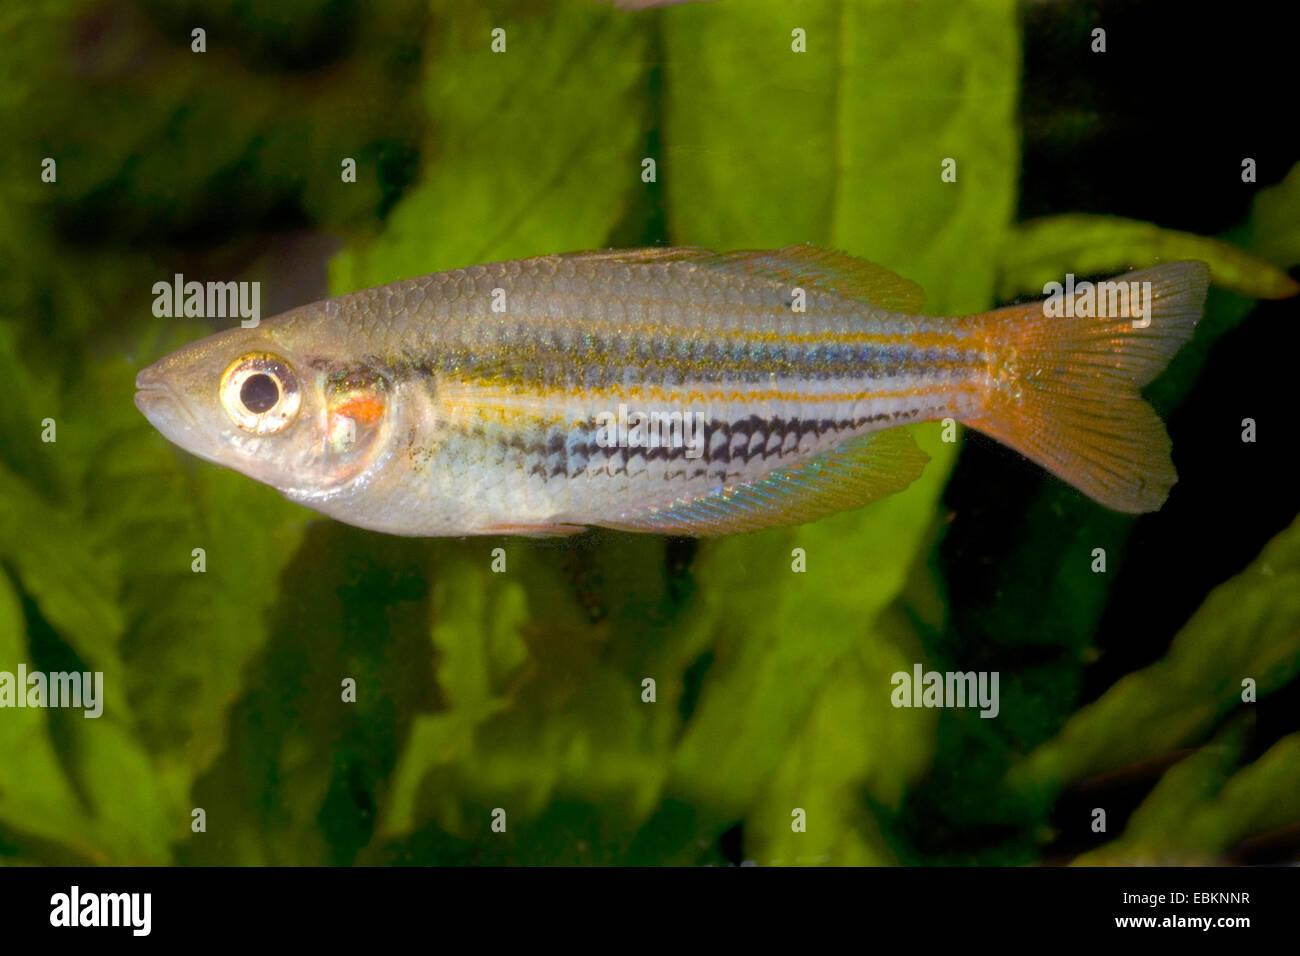 Papua Rainbowfish (Melanotaenia papuae), full length portrait - Stock Image